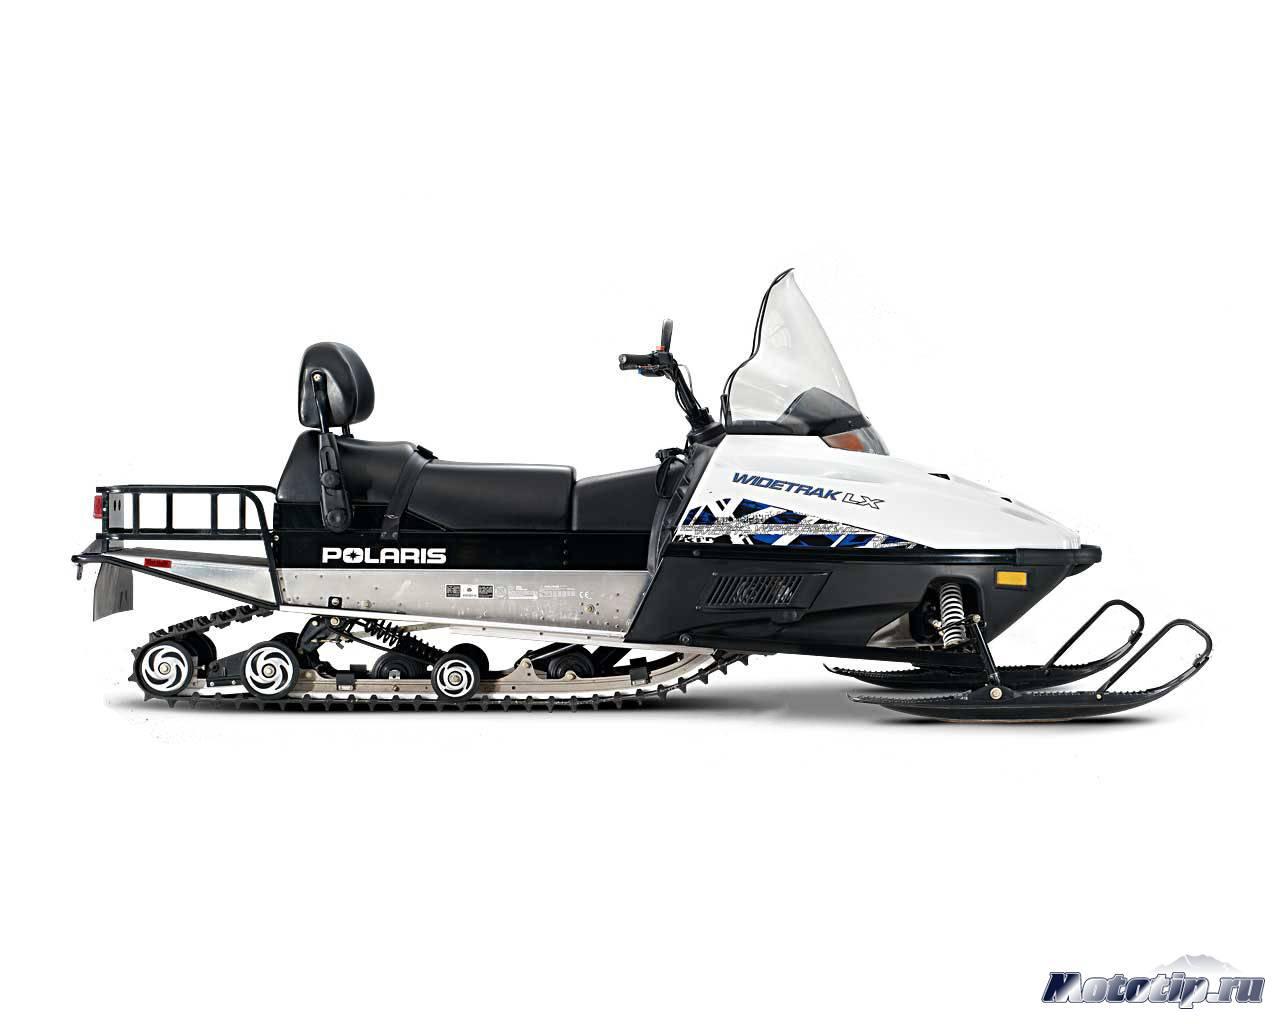 СНЕГОХОД POLARIS 500 WIDETRAK LX  Артмото - купить квадроцикл в украине и харькове, мотоцикл, снегоход, скутер, мопед, электромобиль